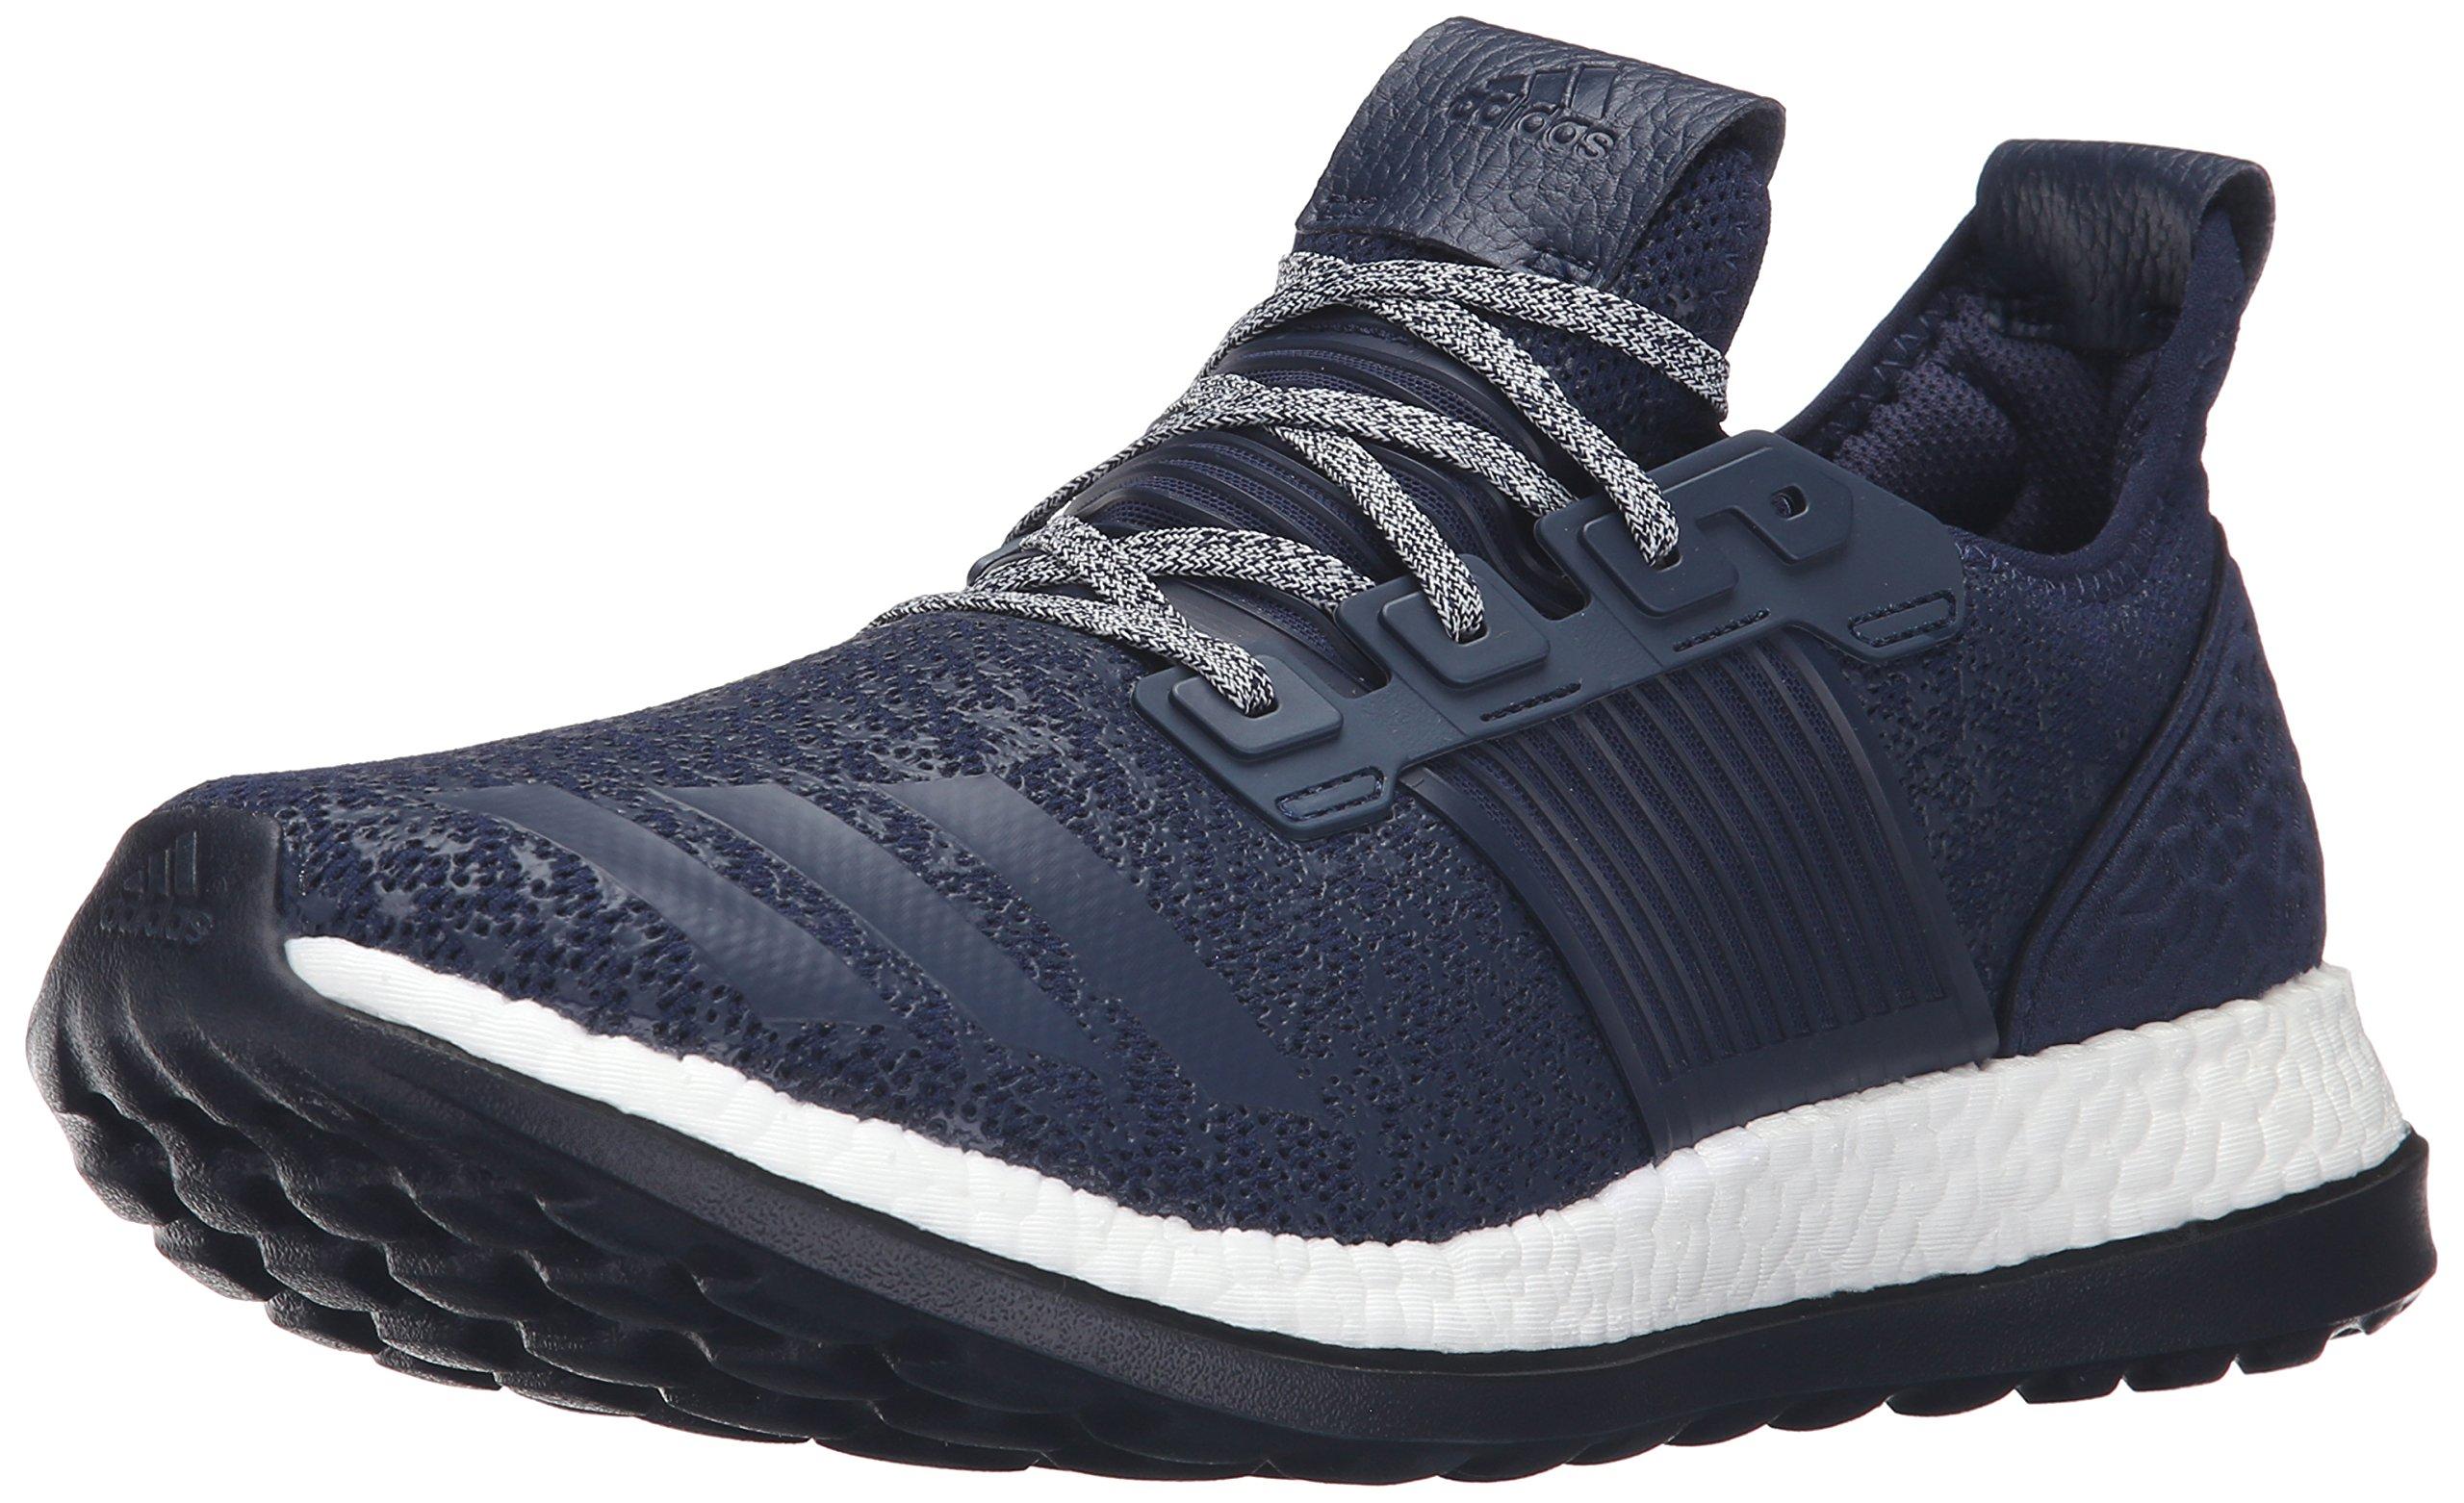 Galleon Men's M Zg Running Pureboost Collegiate Shoe Adidas White wUwaqxz